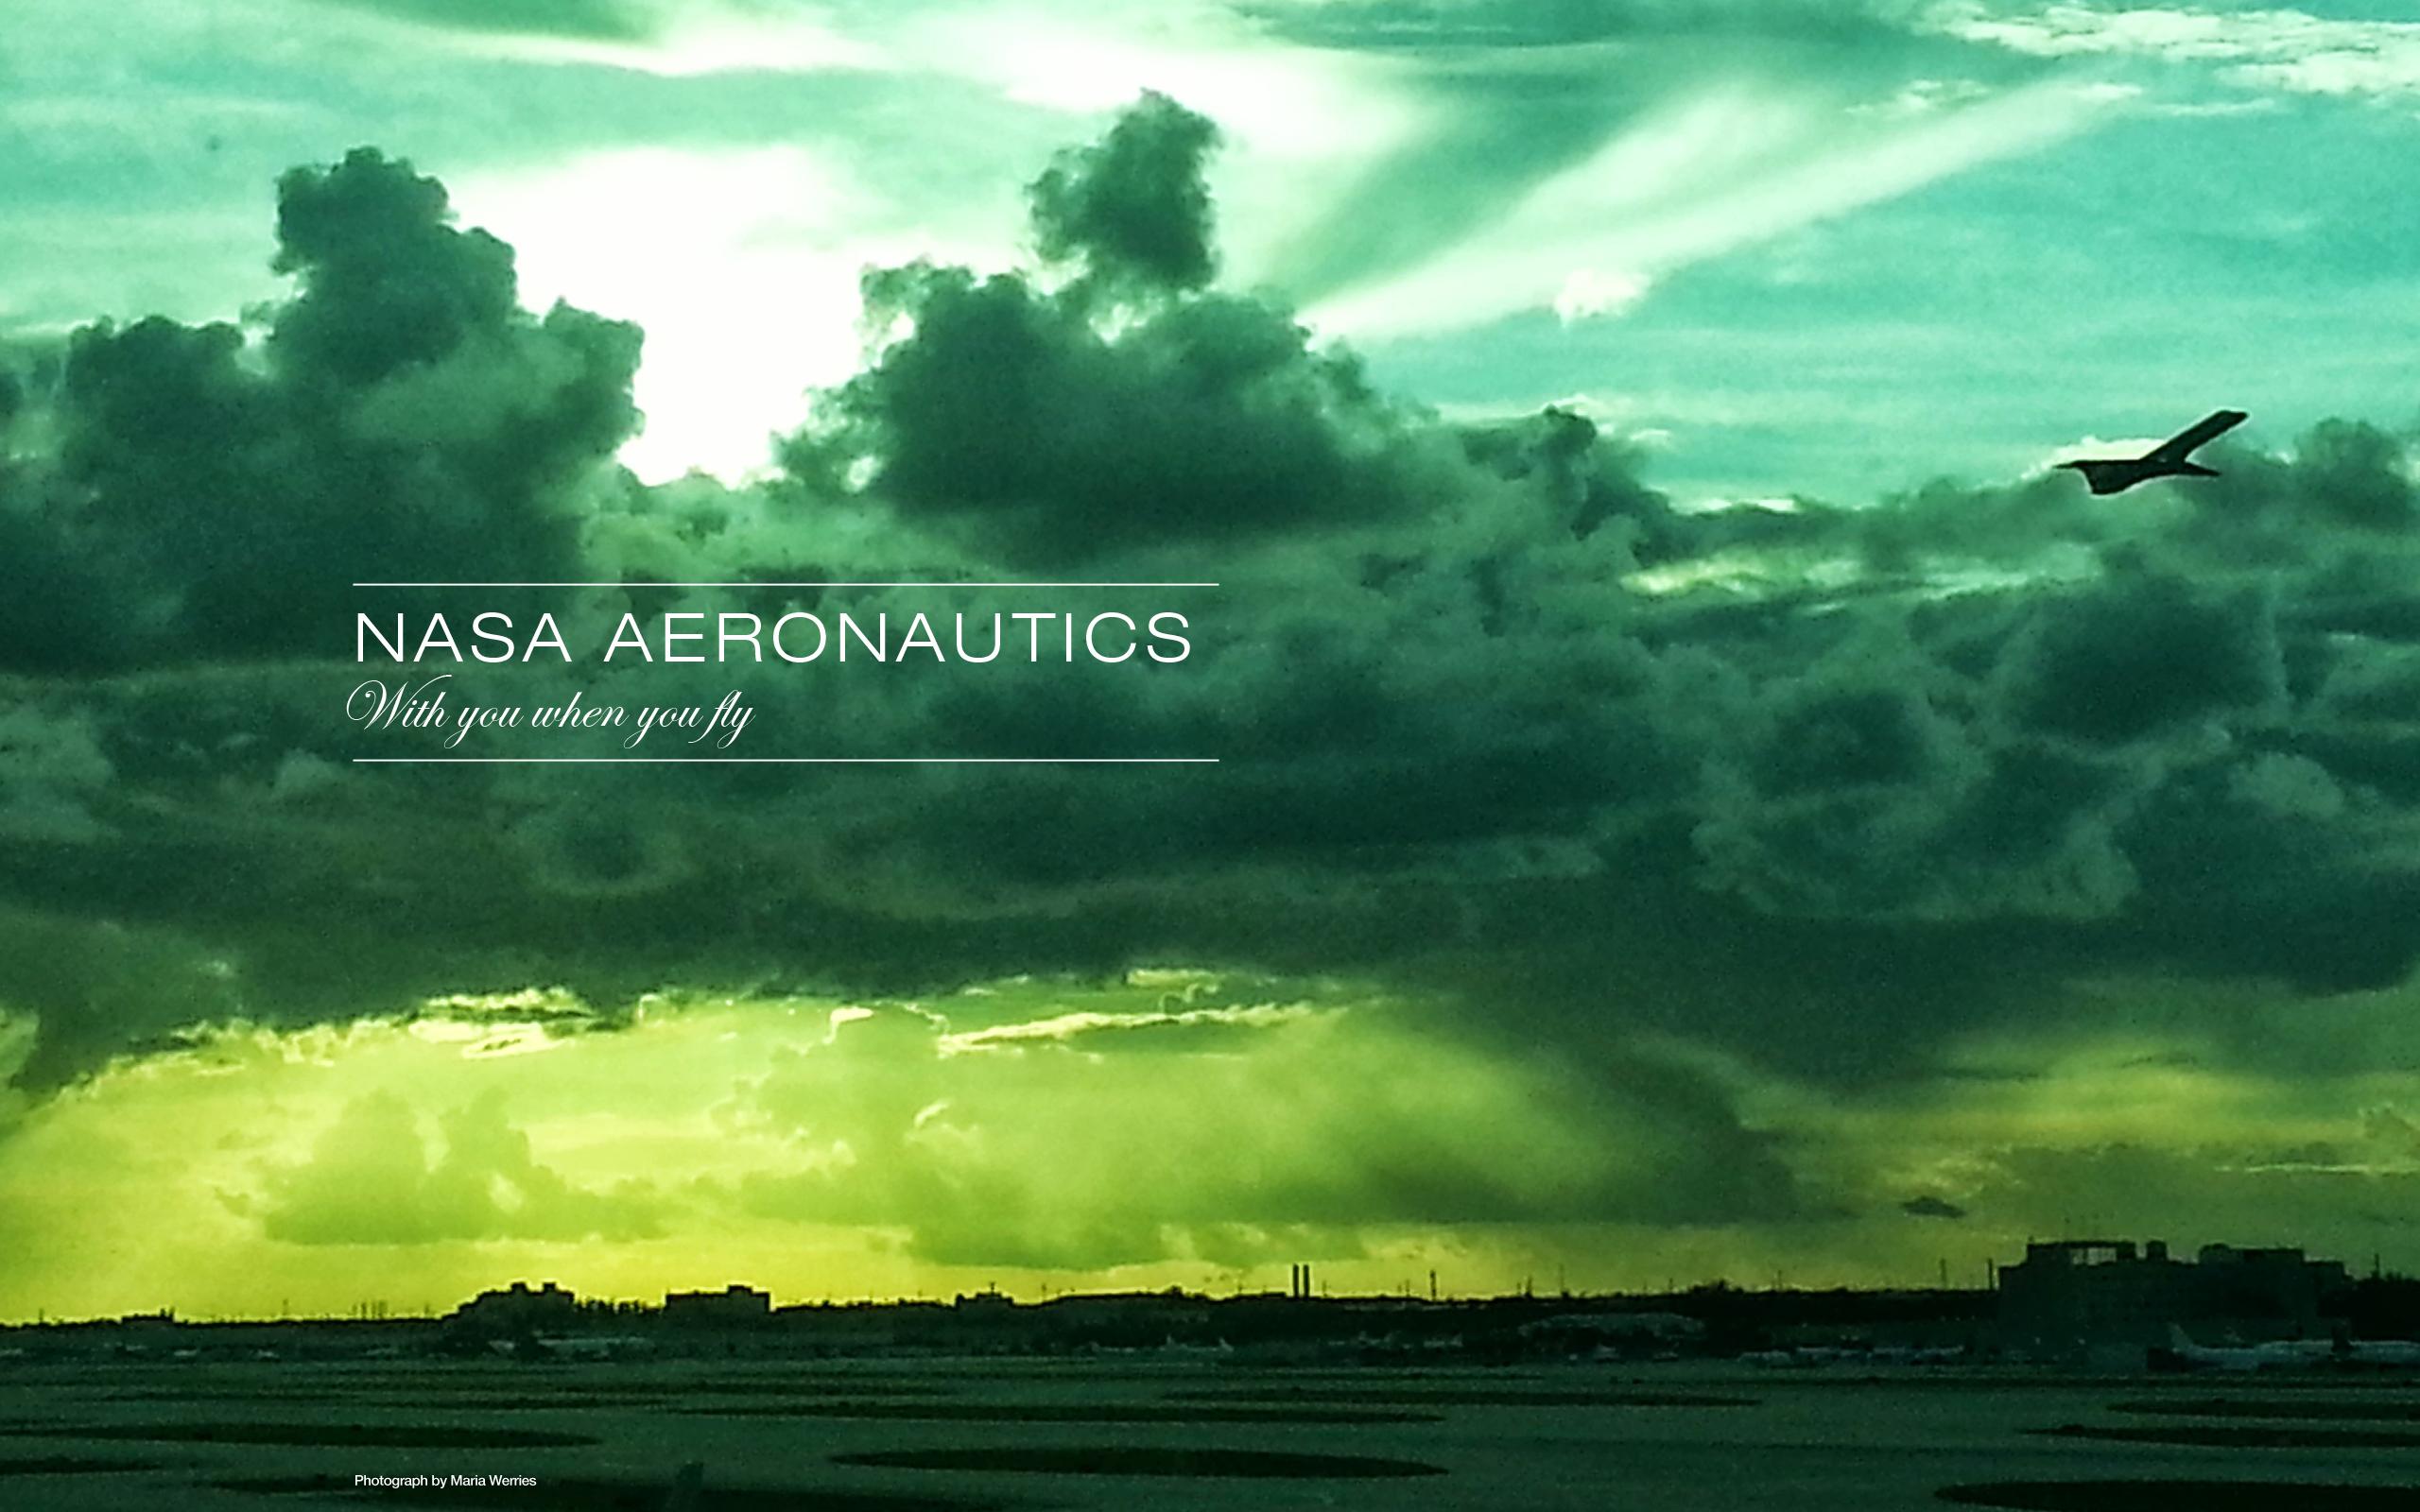 Wallpaper iphone x files - Nasa Aeronautics Wallpaper Design 3